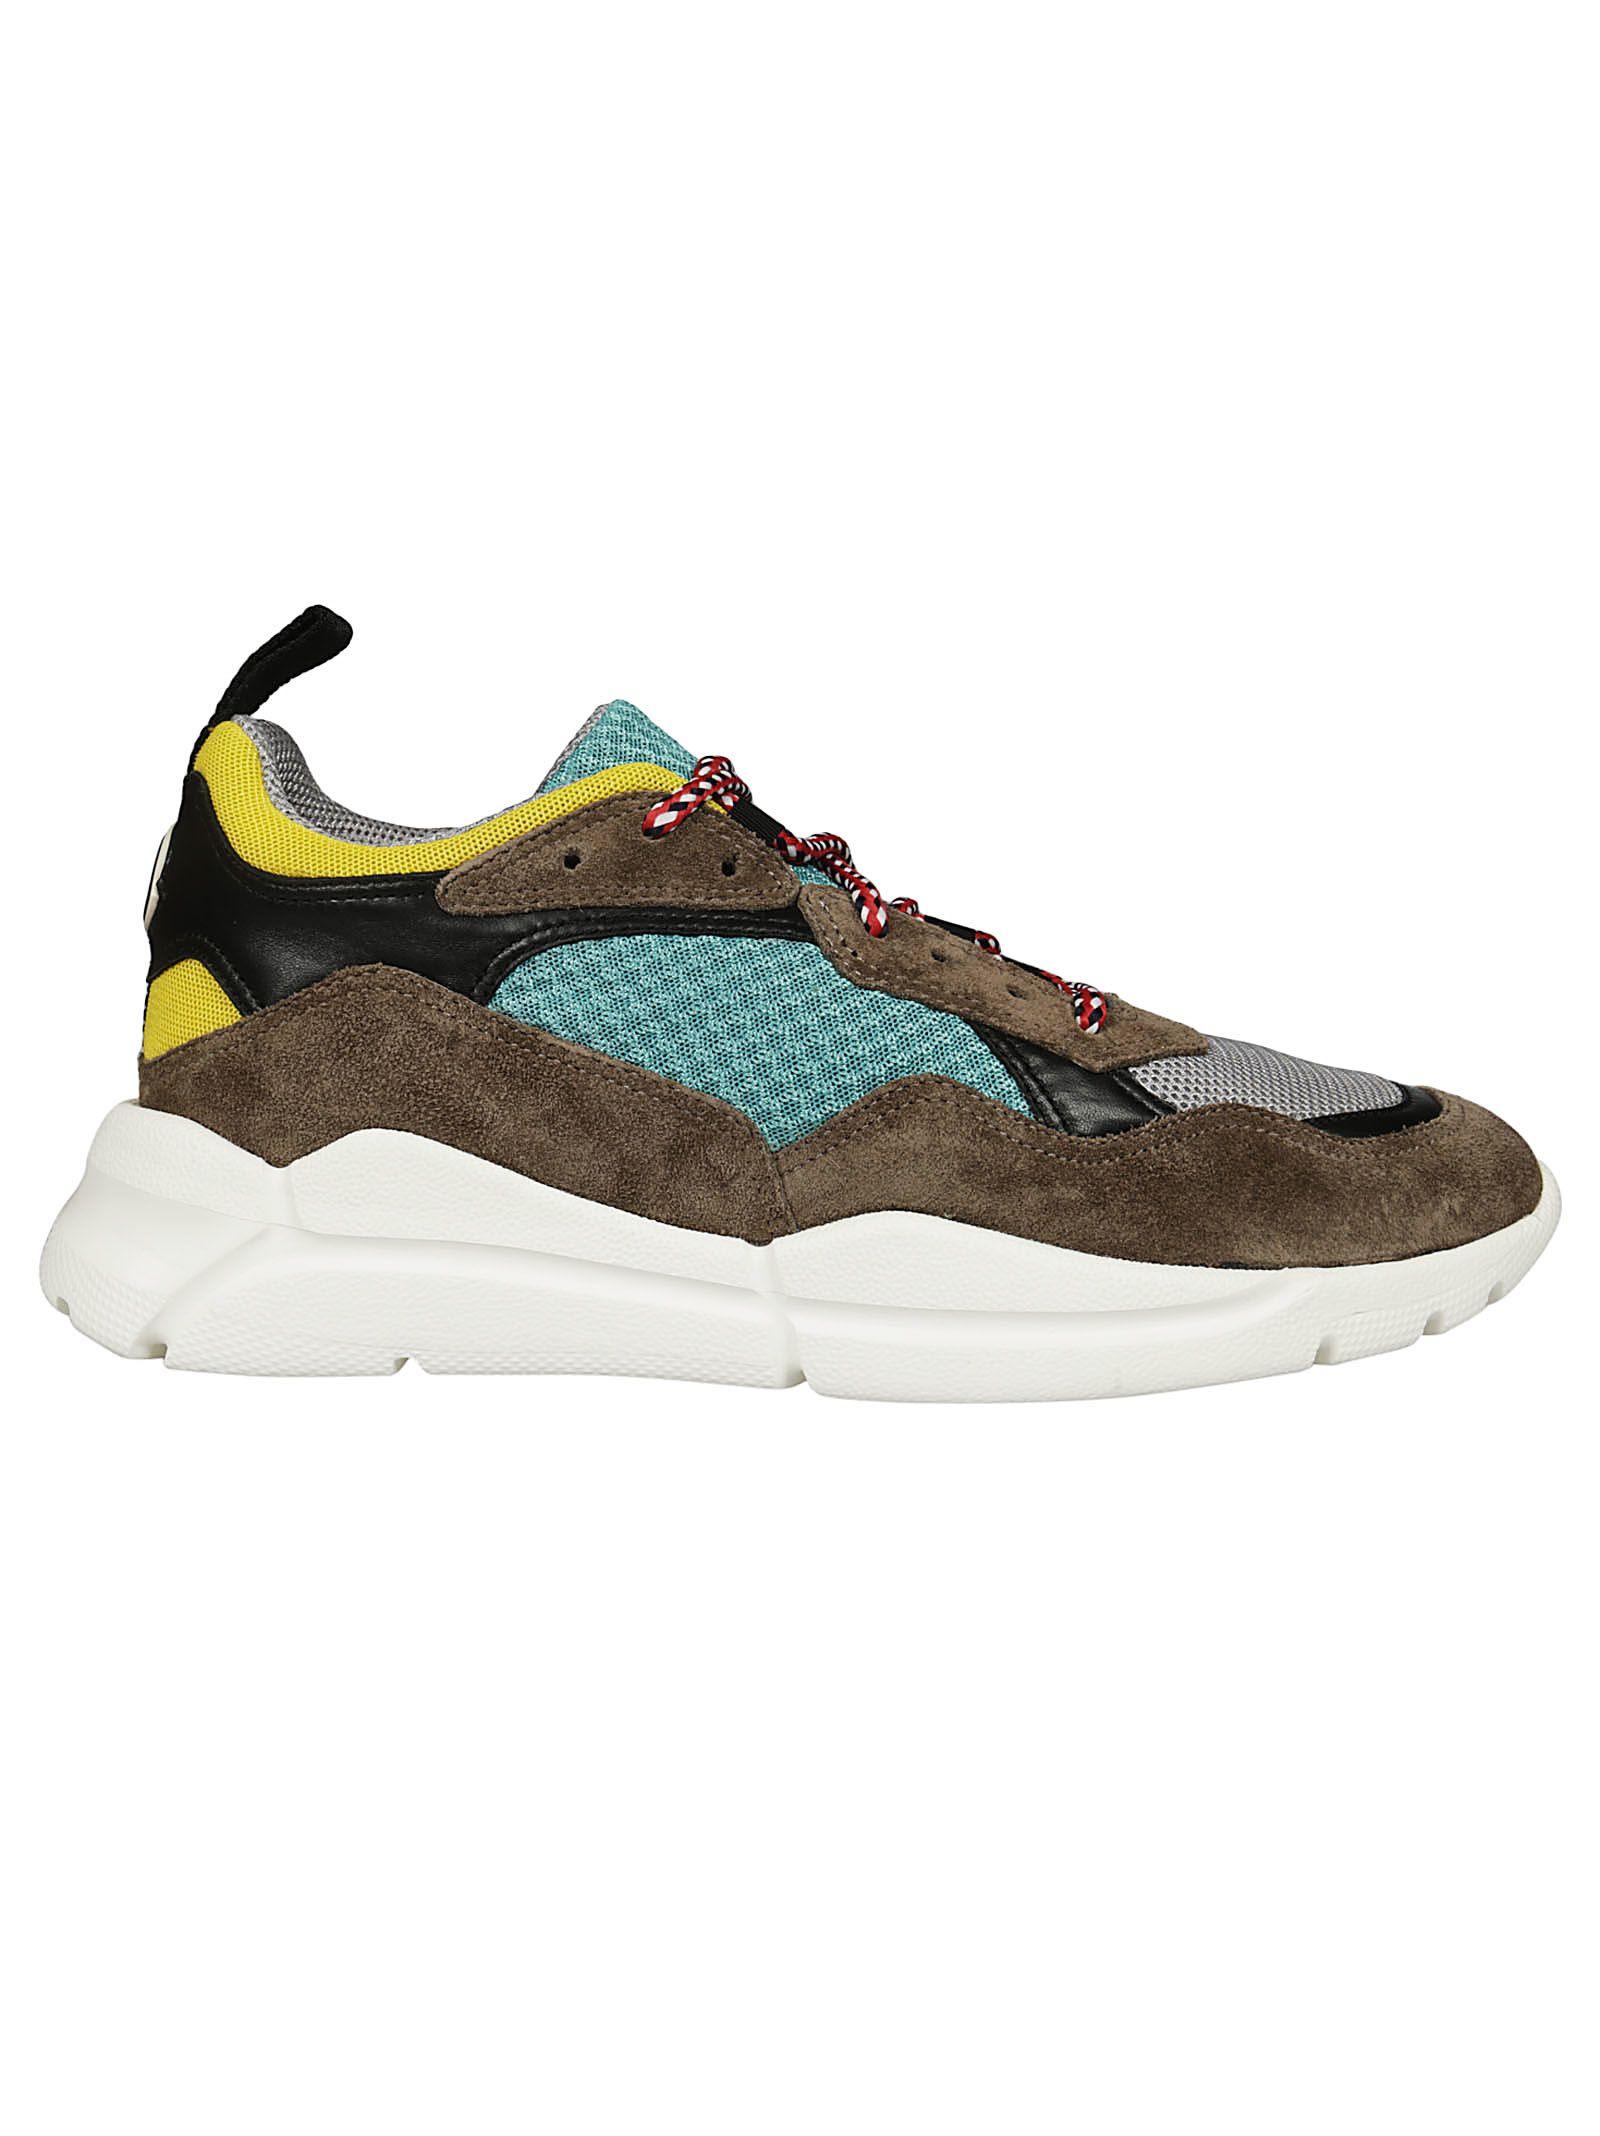 Moncler Calum Sneakers